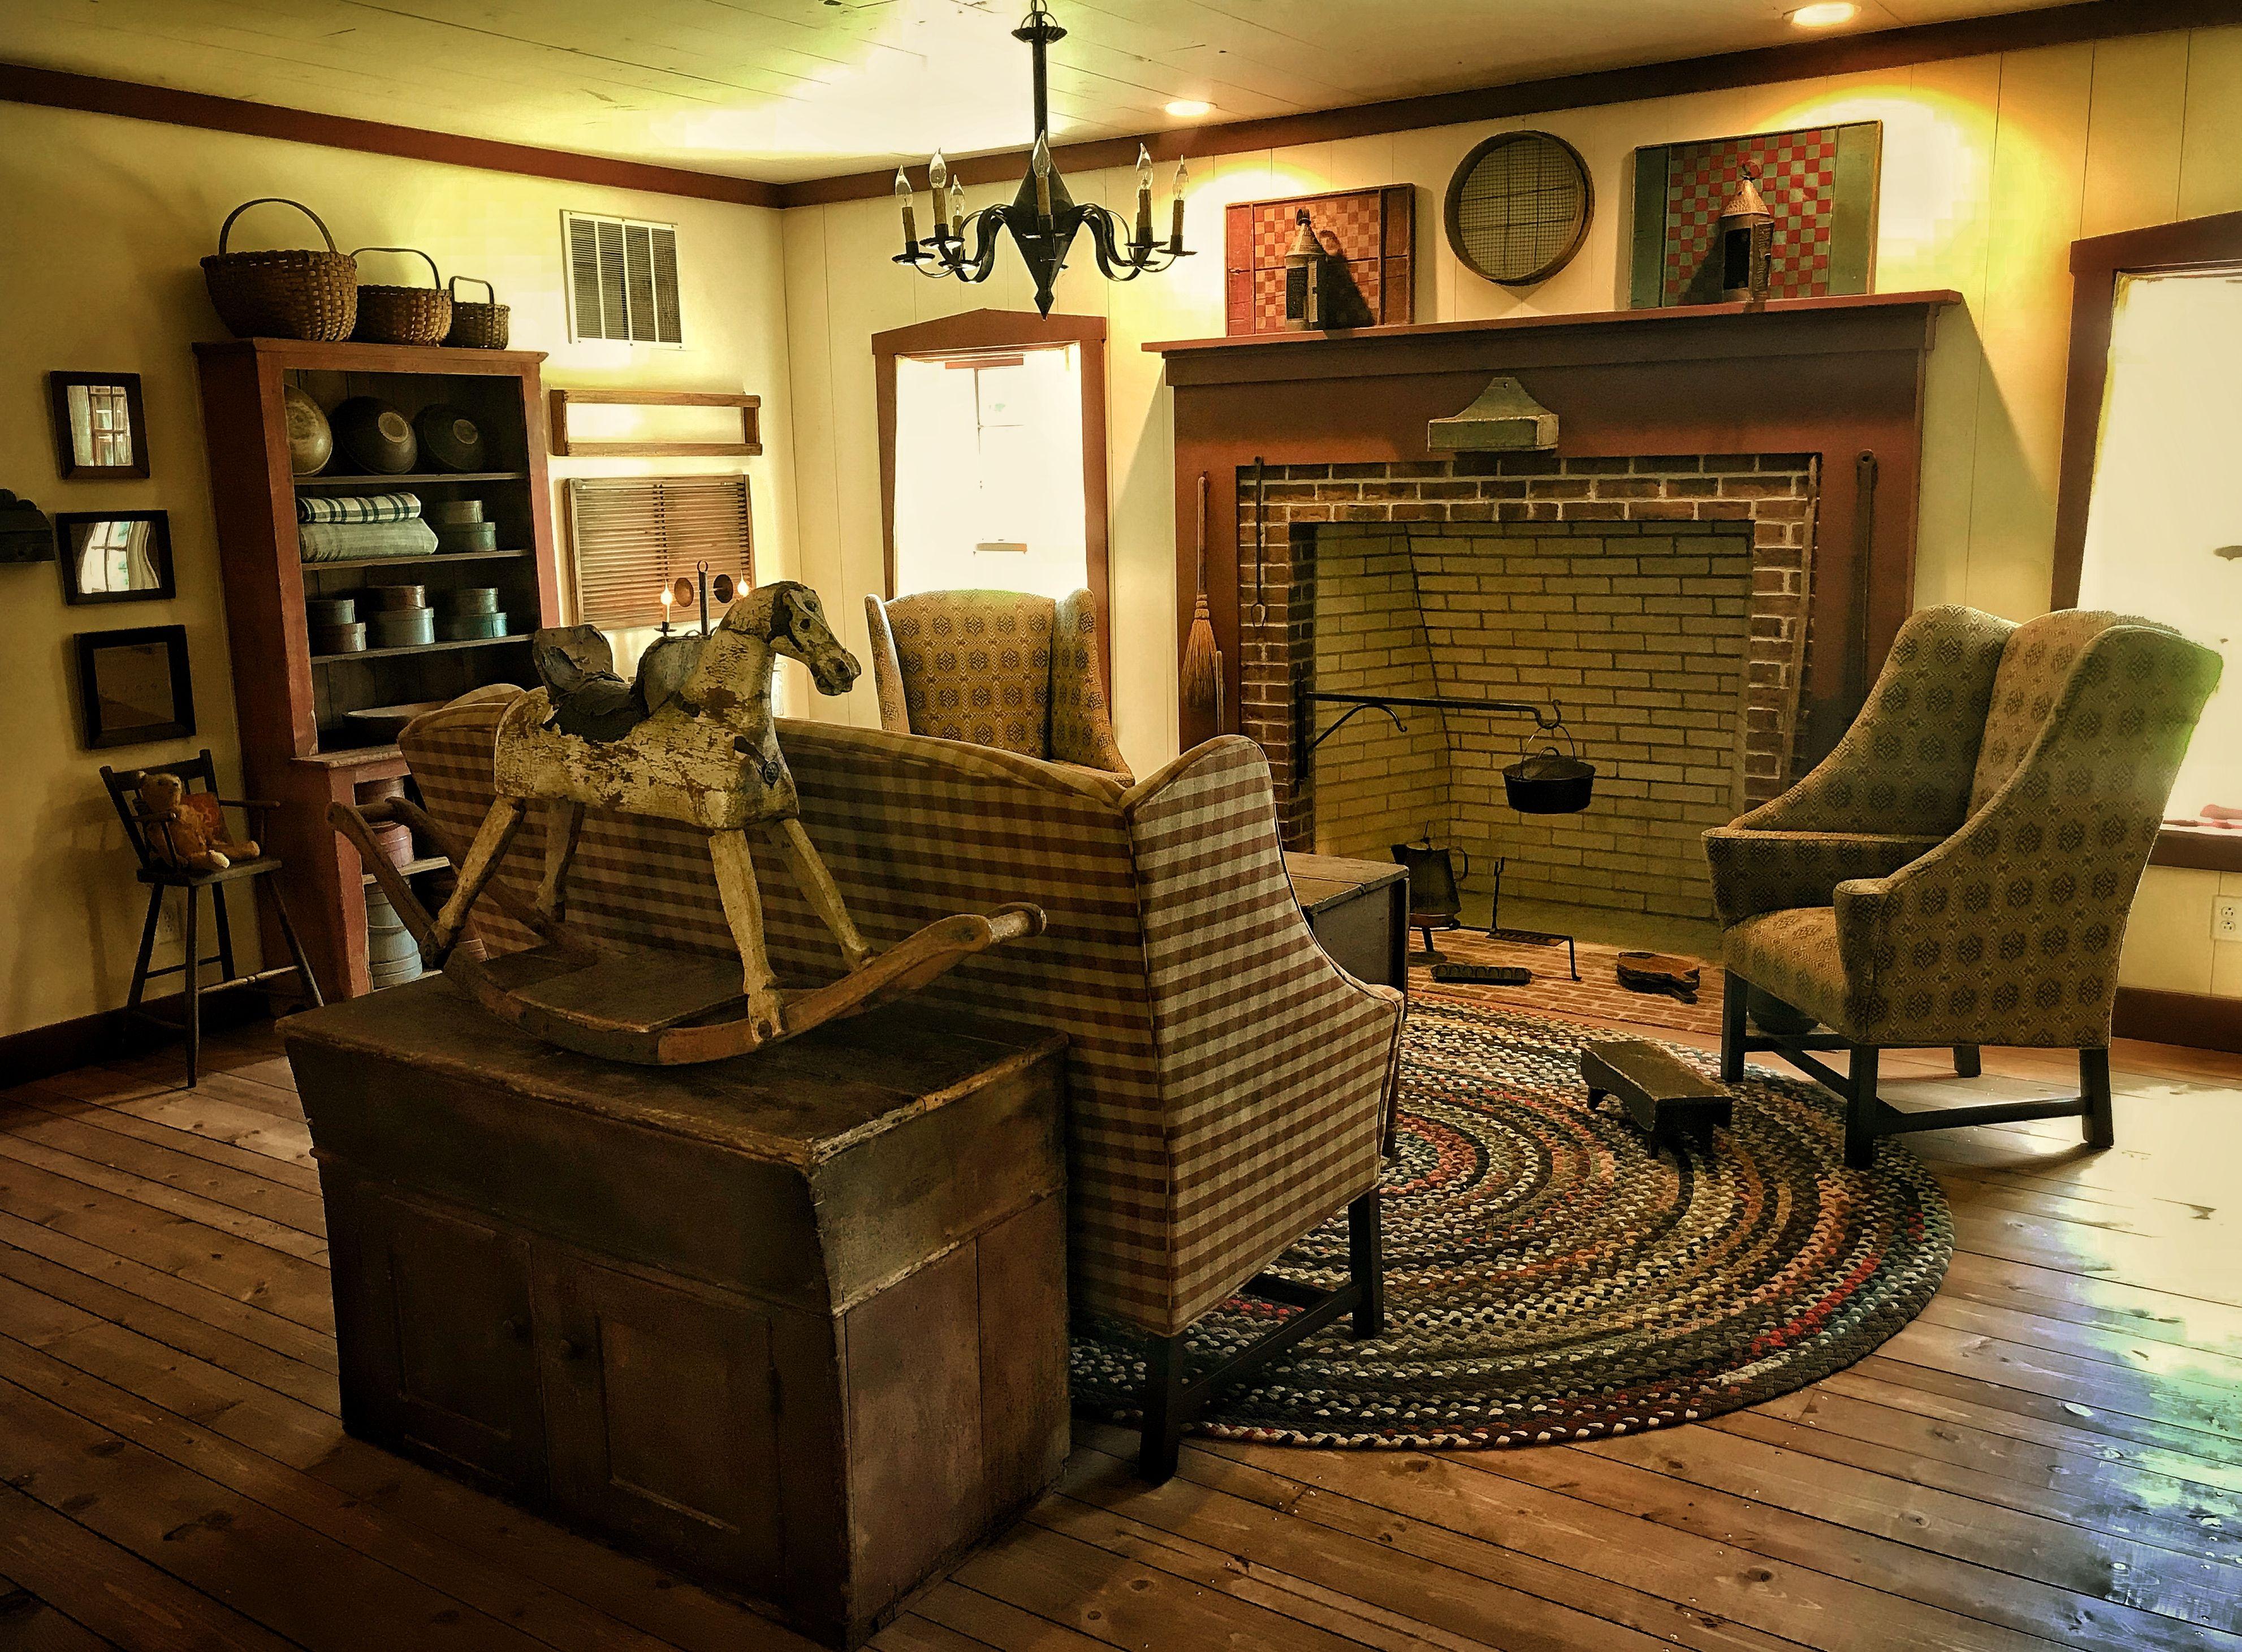 Keeping Room Primitive Living Room Primitive Decorating Country Primitive Homes #primitive #pictures #for #living #room